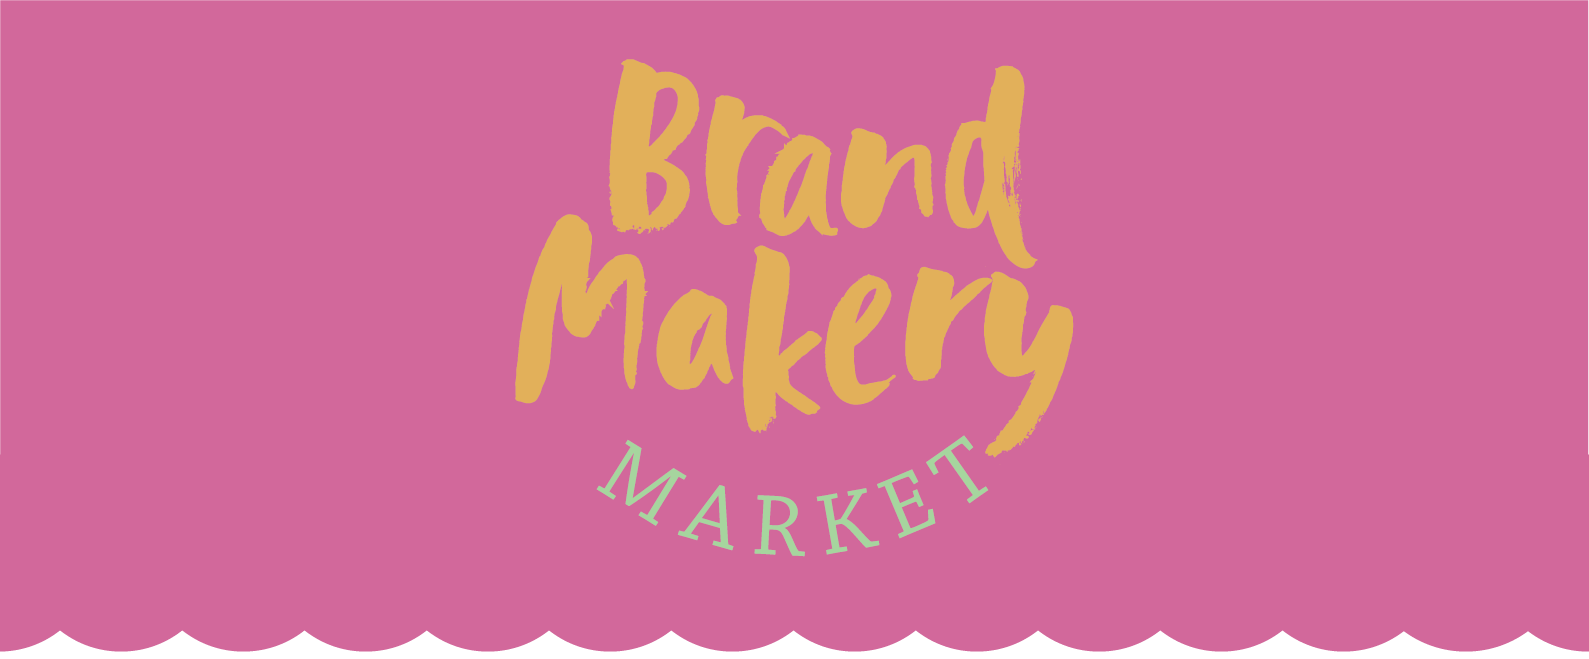 Brand Makery Market